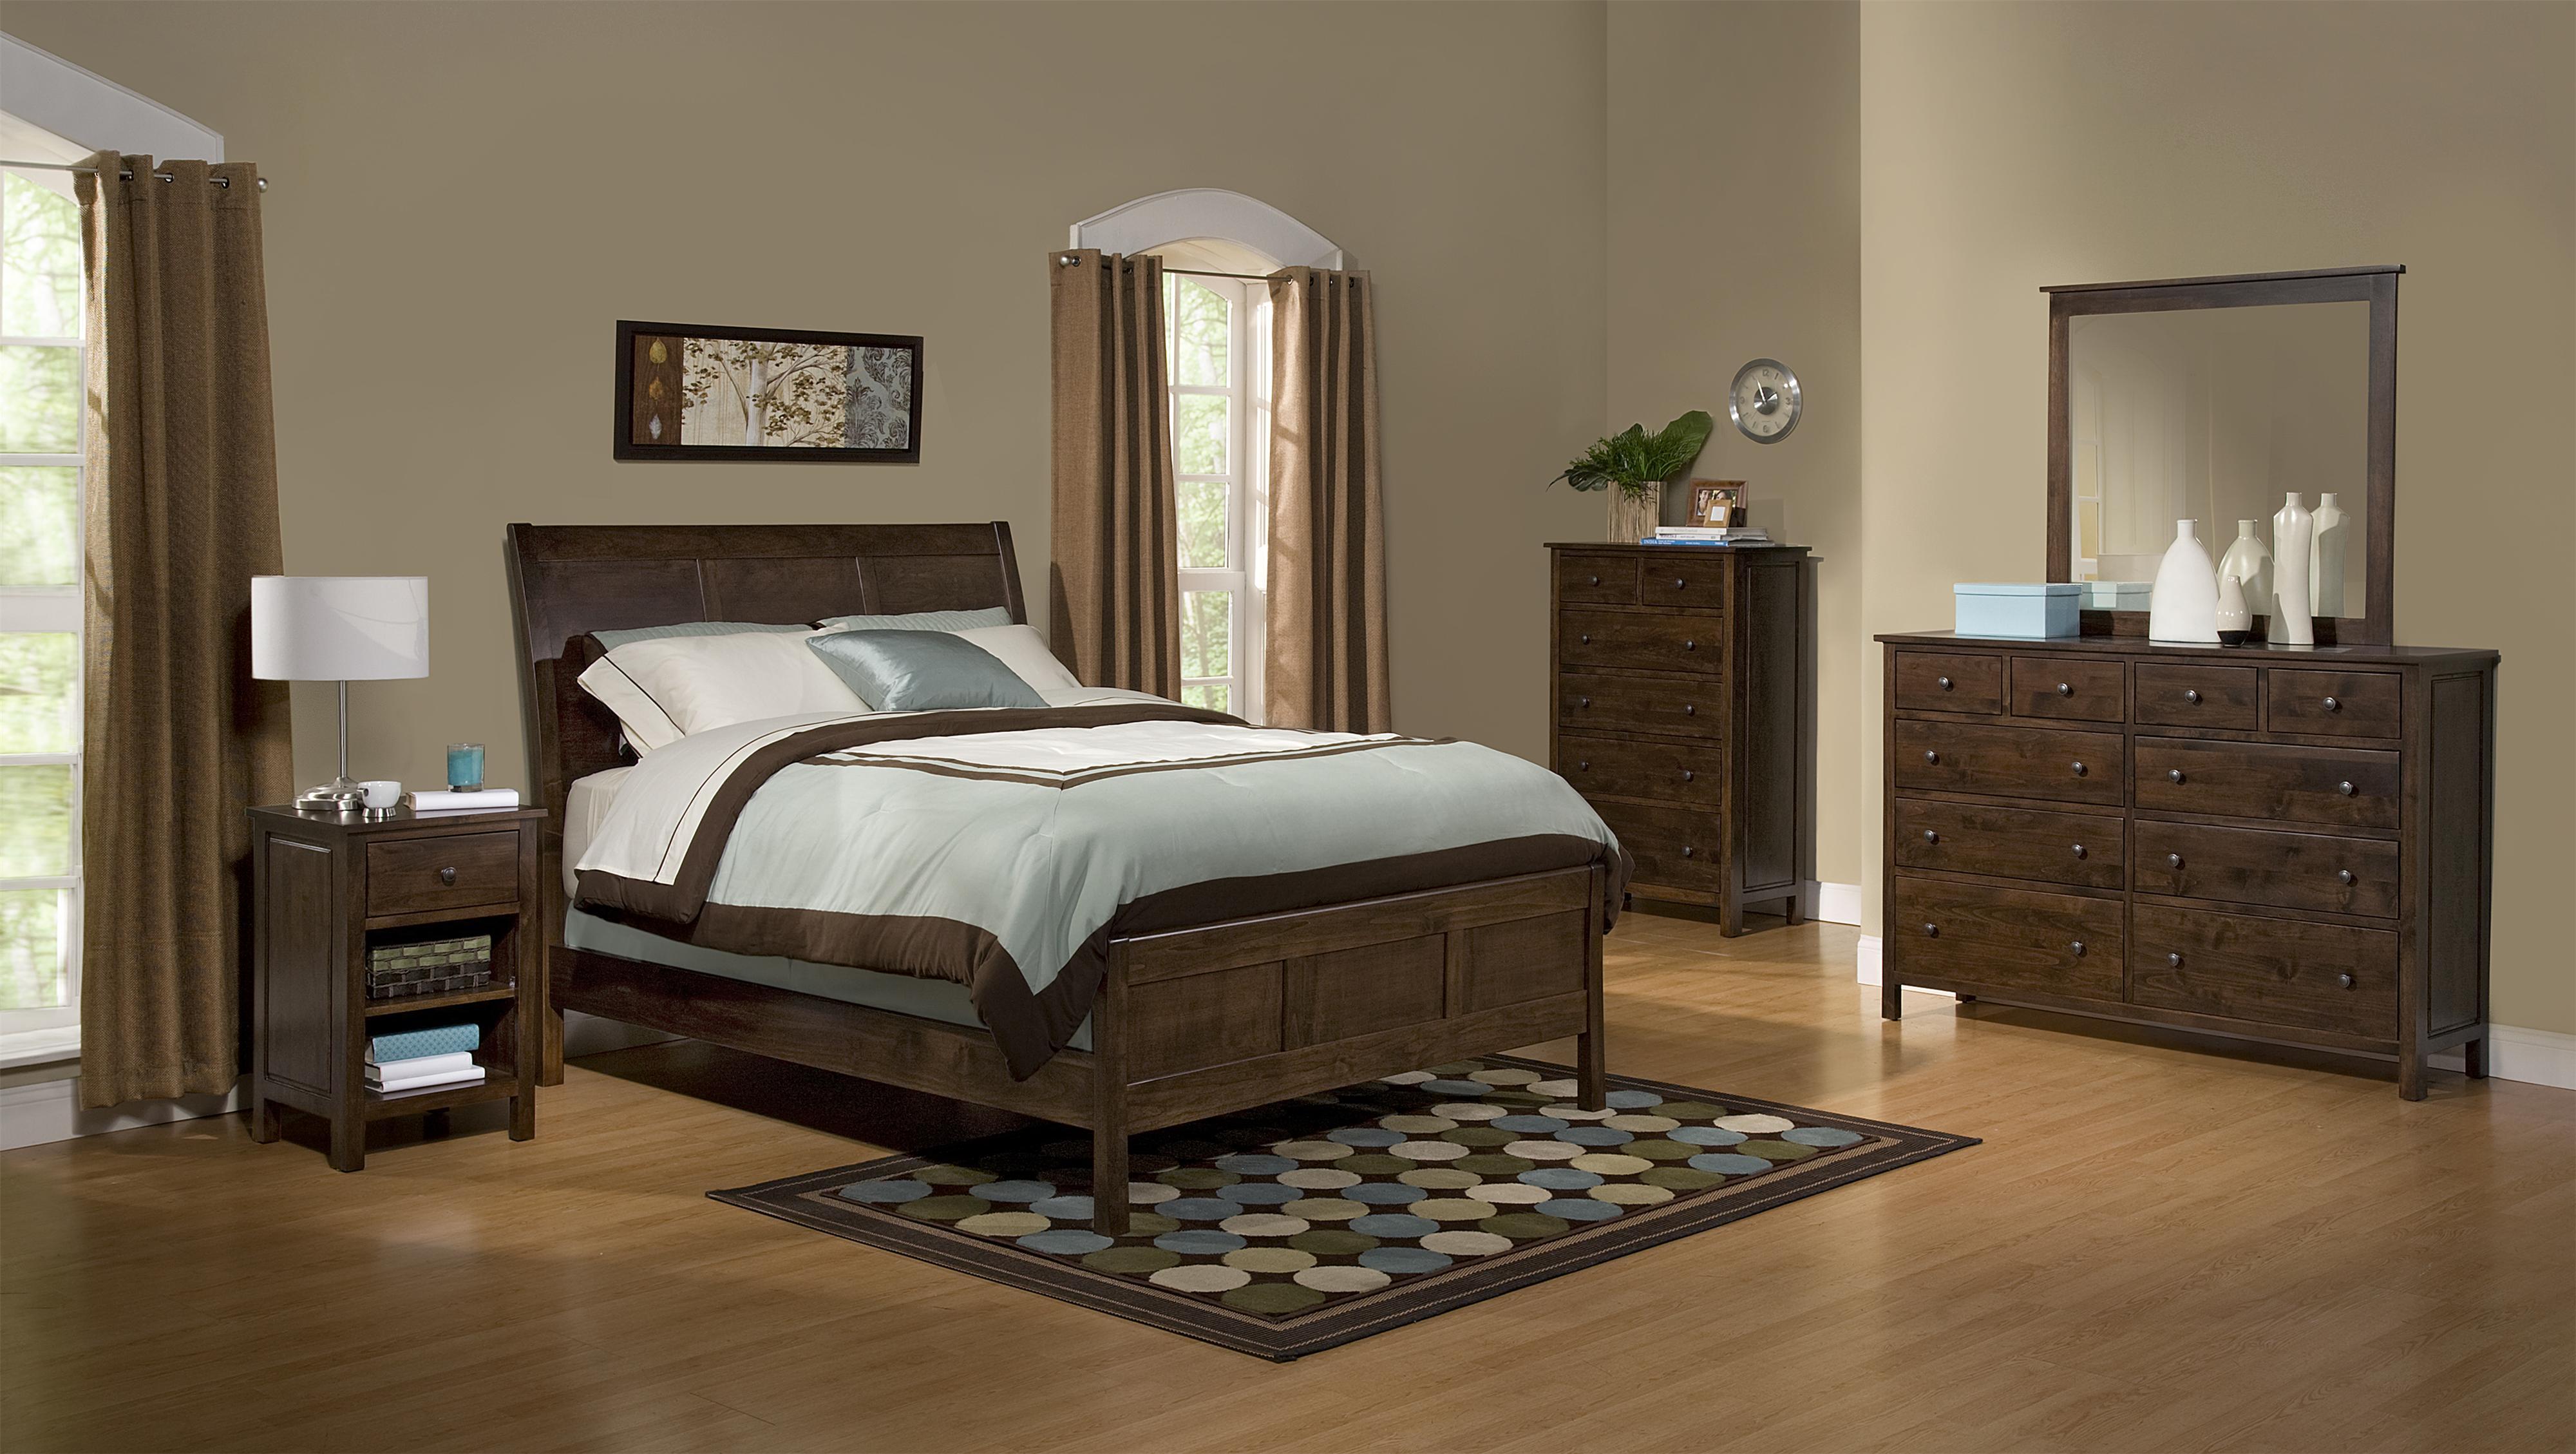 Alder Heritage - Brown Mahogany Queen Bedroom Group by Archbold Furniture at Steger's Furniture